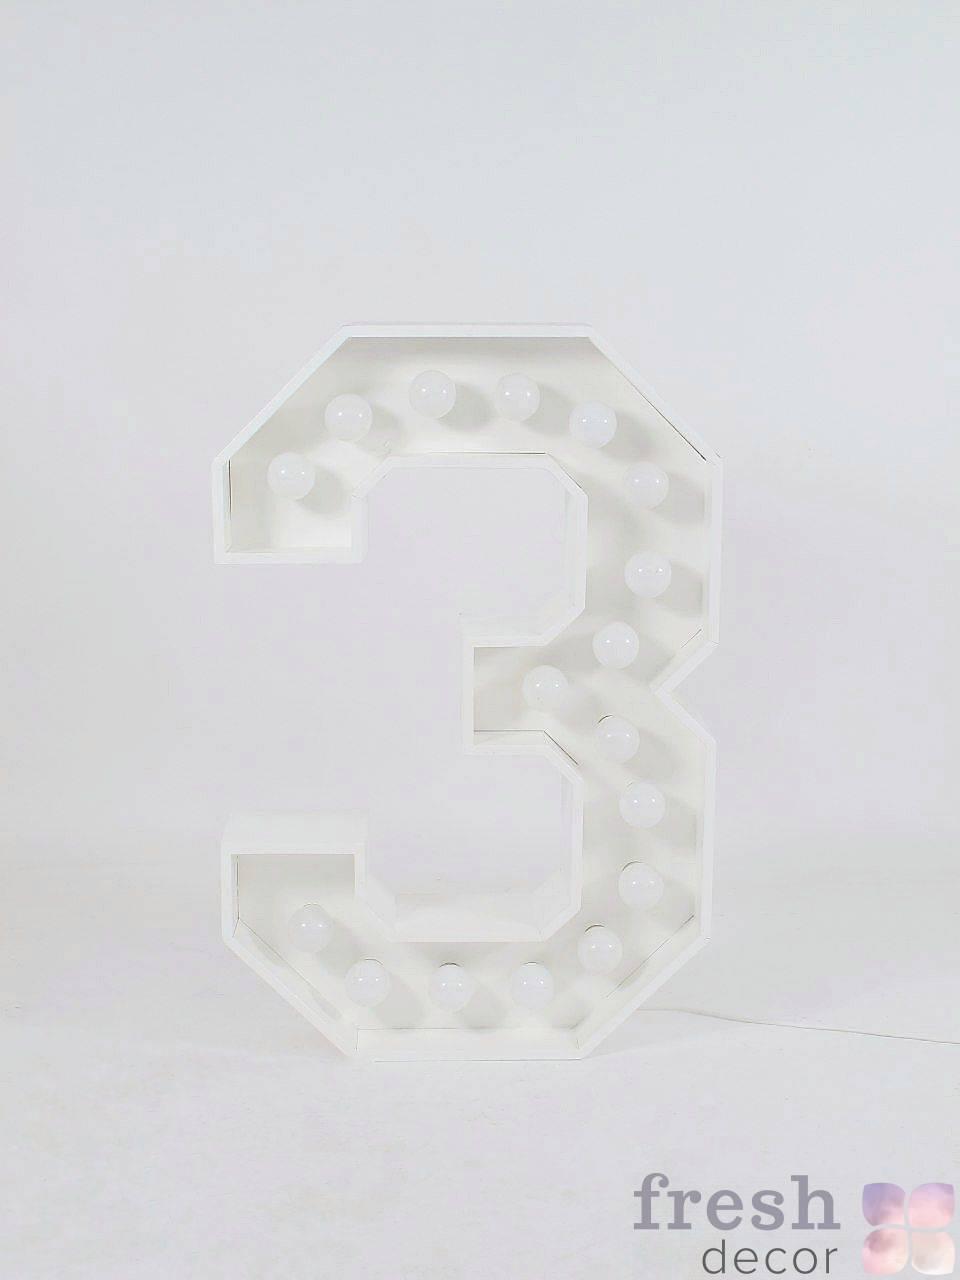 belaya cifra 3 s lampochkami v arendu